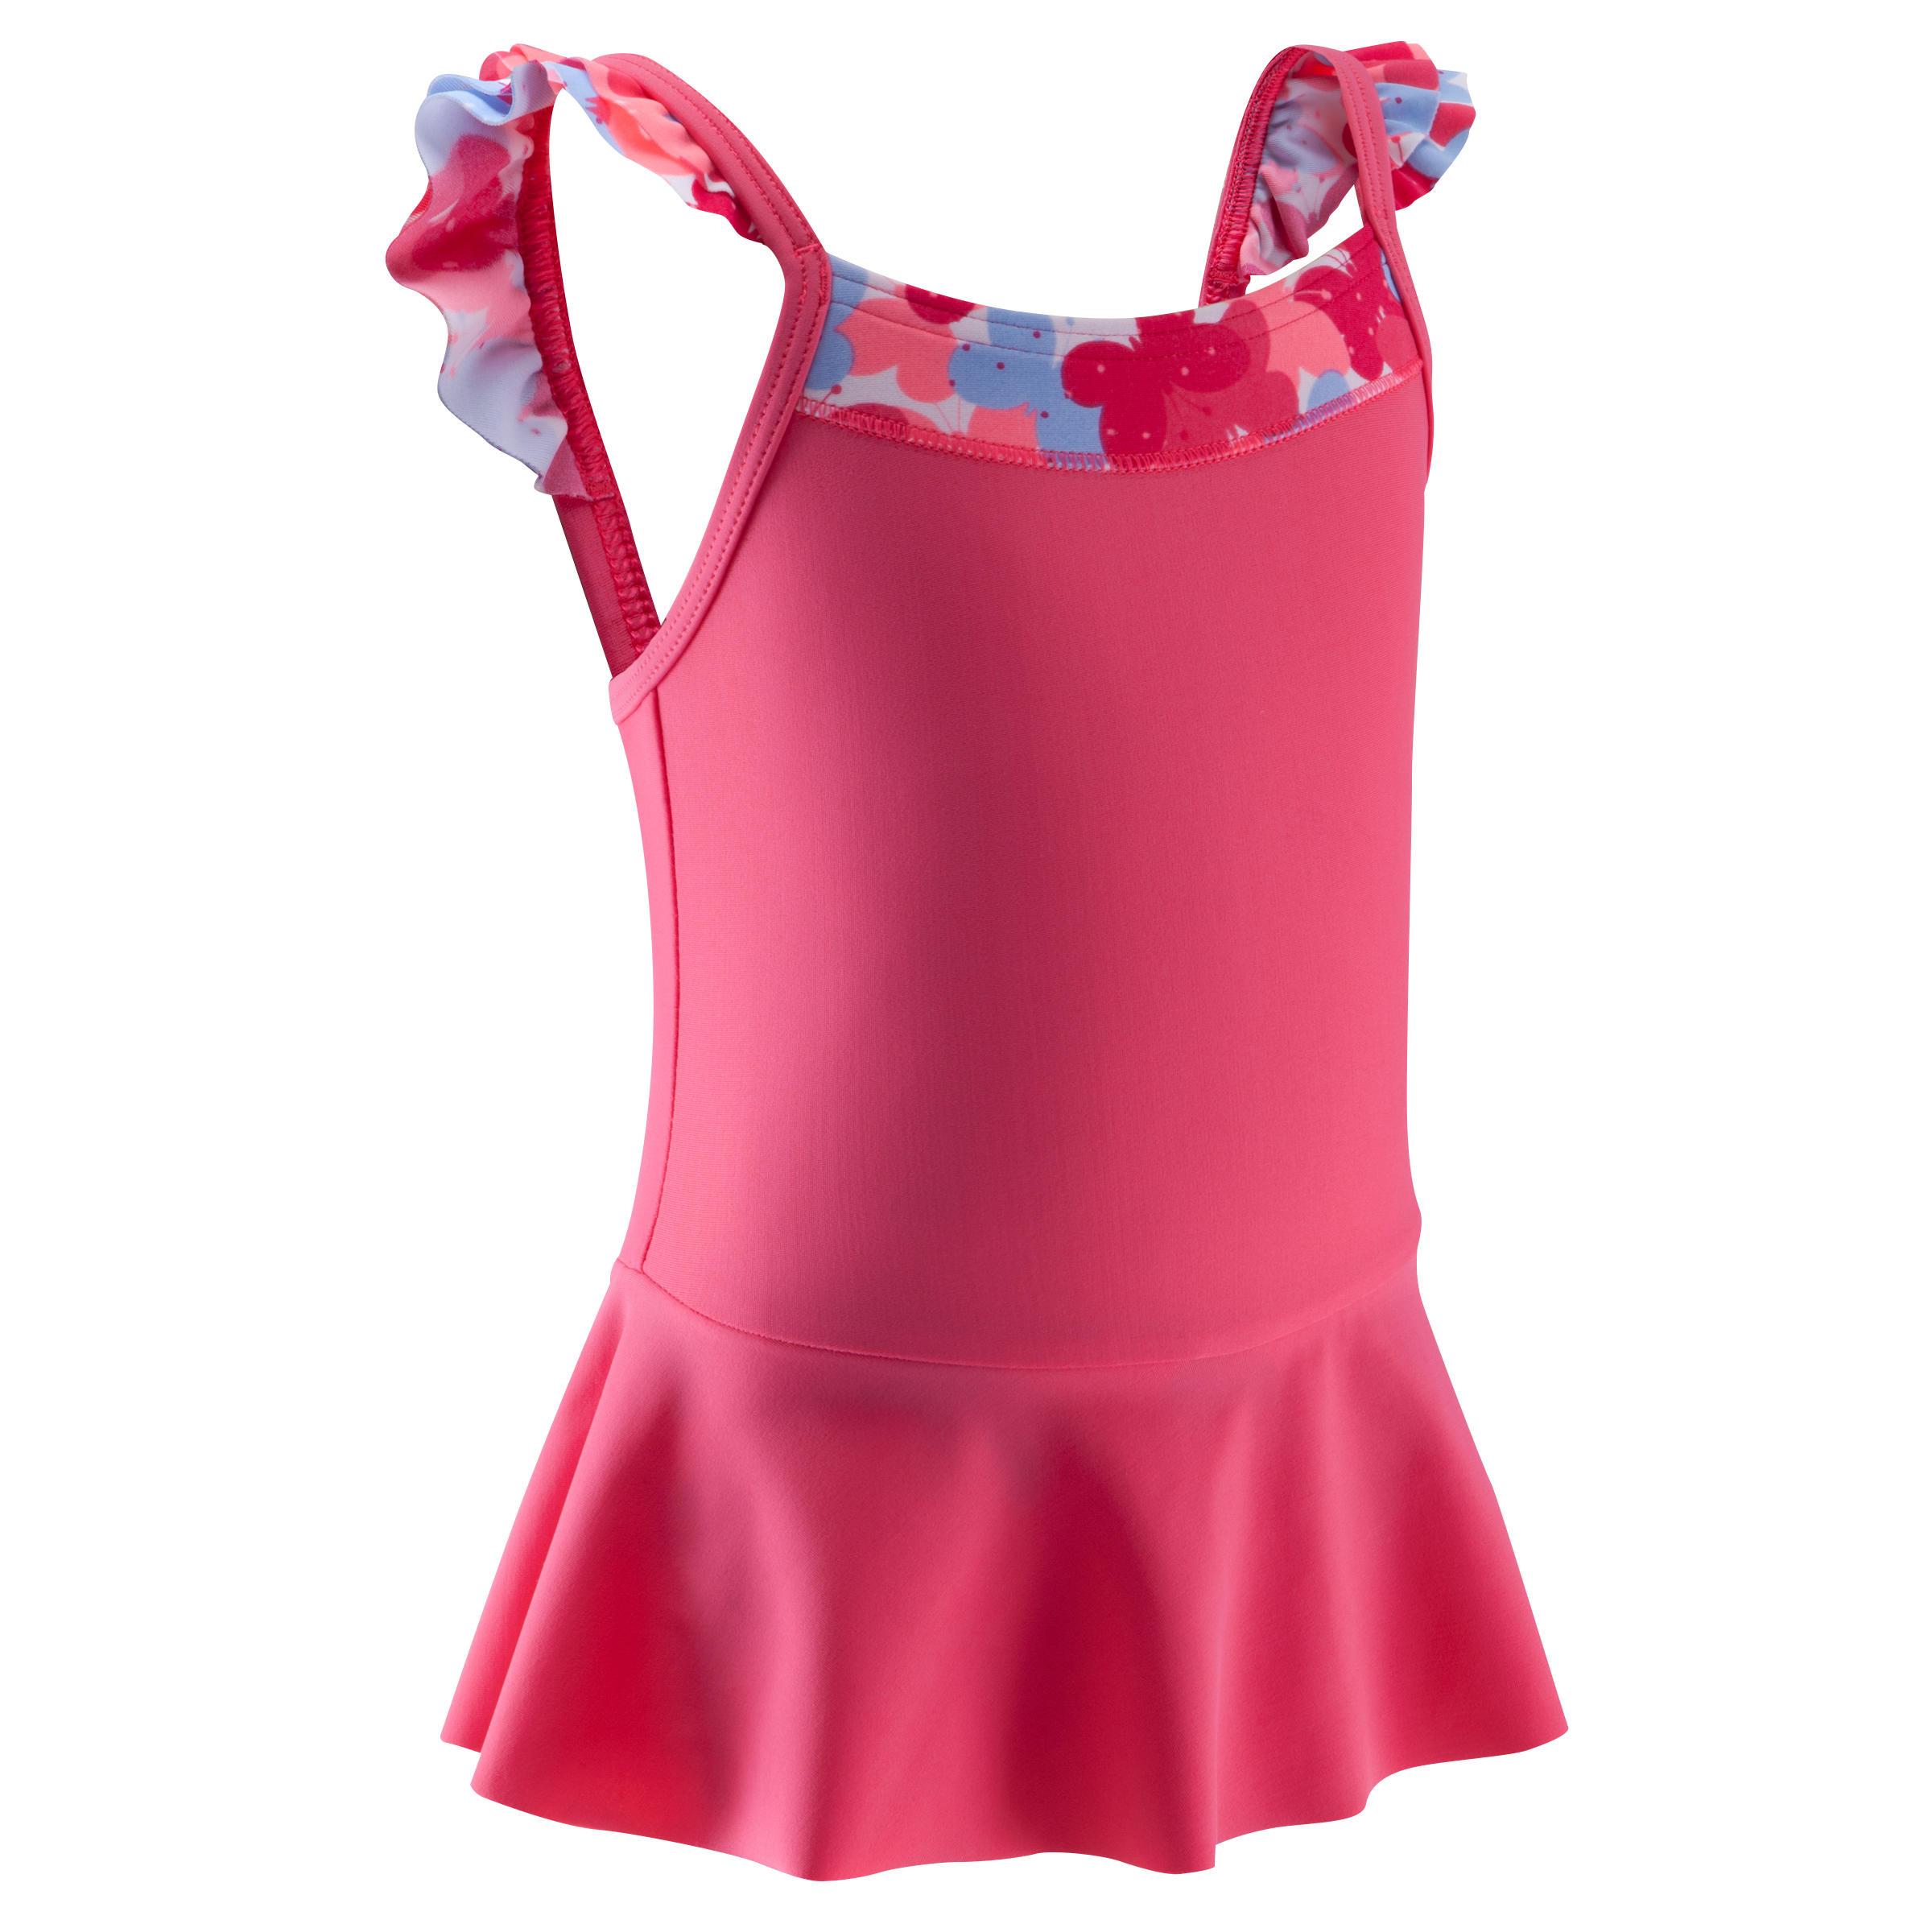 Madina+ Baby Girls' Miniskirt Swimsuit - All Fly